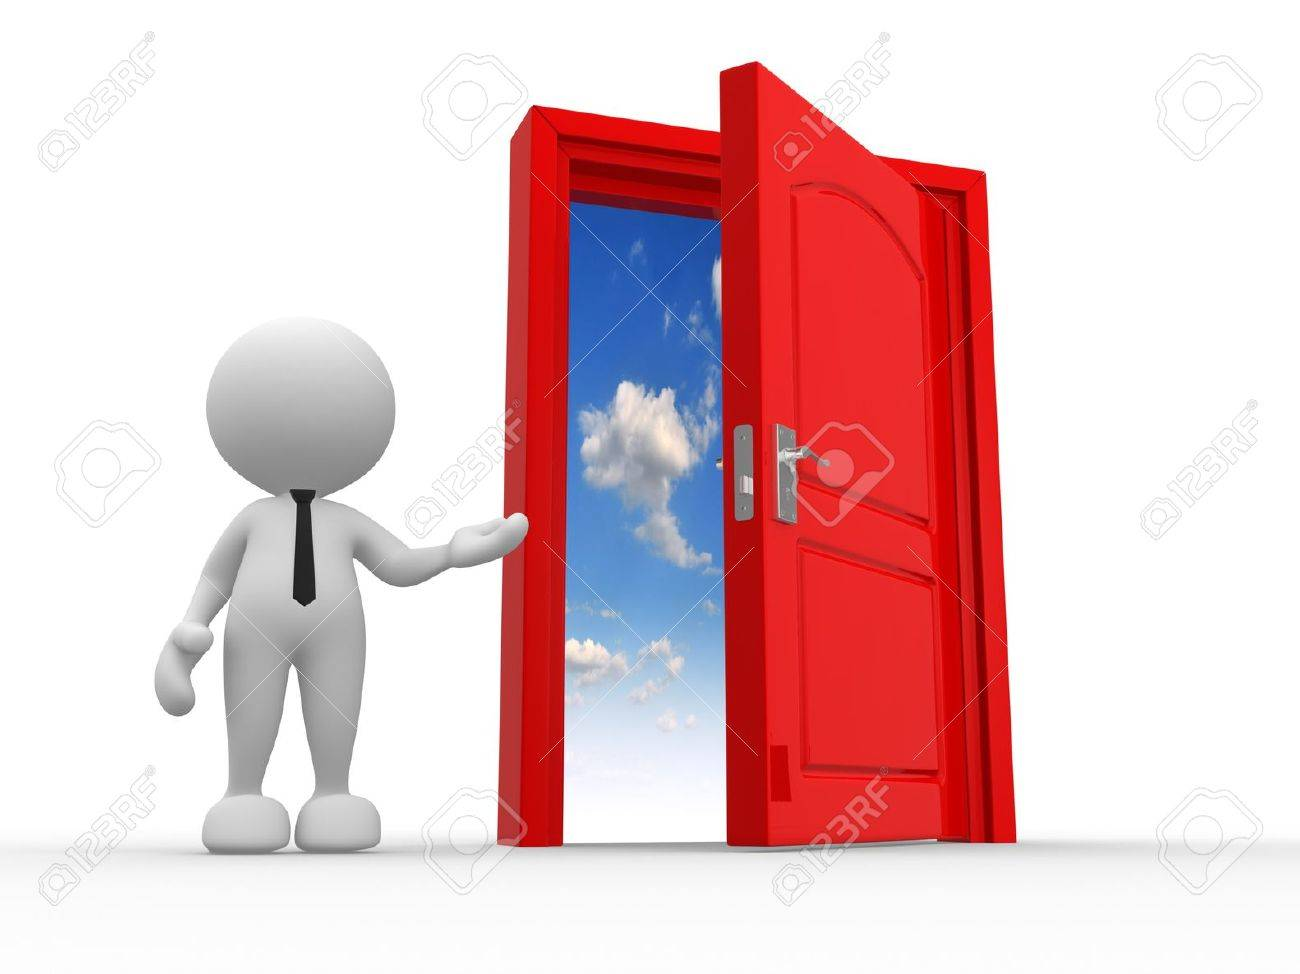 Open Door Welcome Clipart 3,323 welcome door stock illustrations, cliparts and royalty free